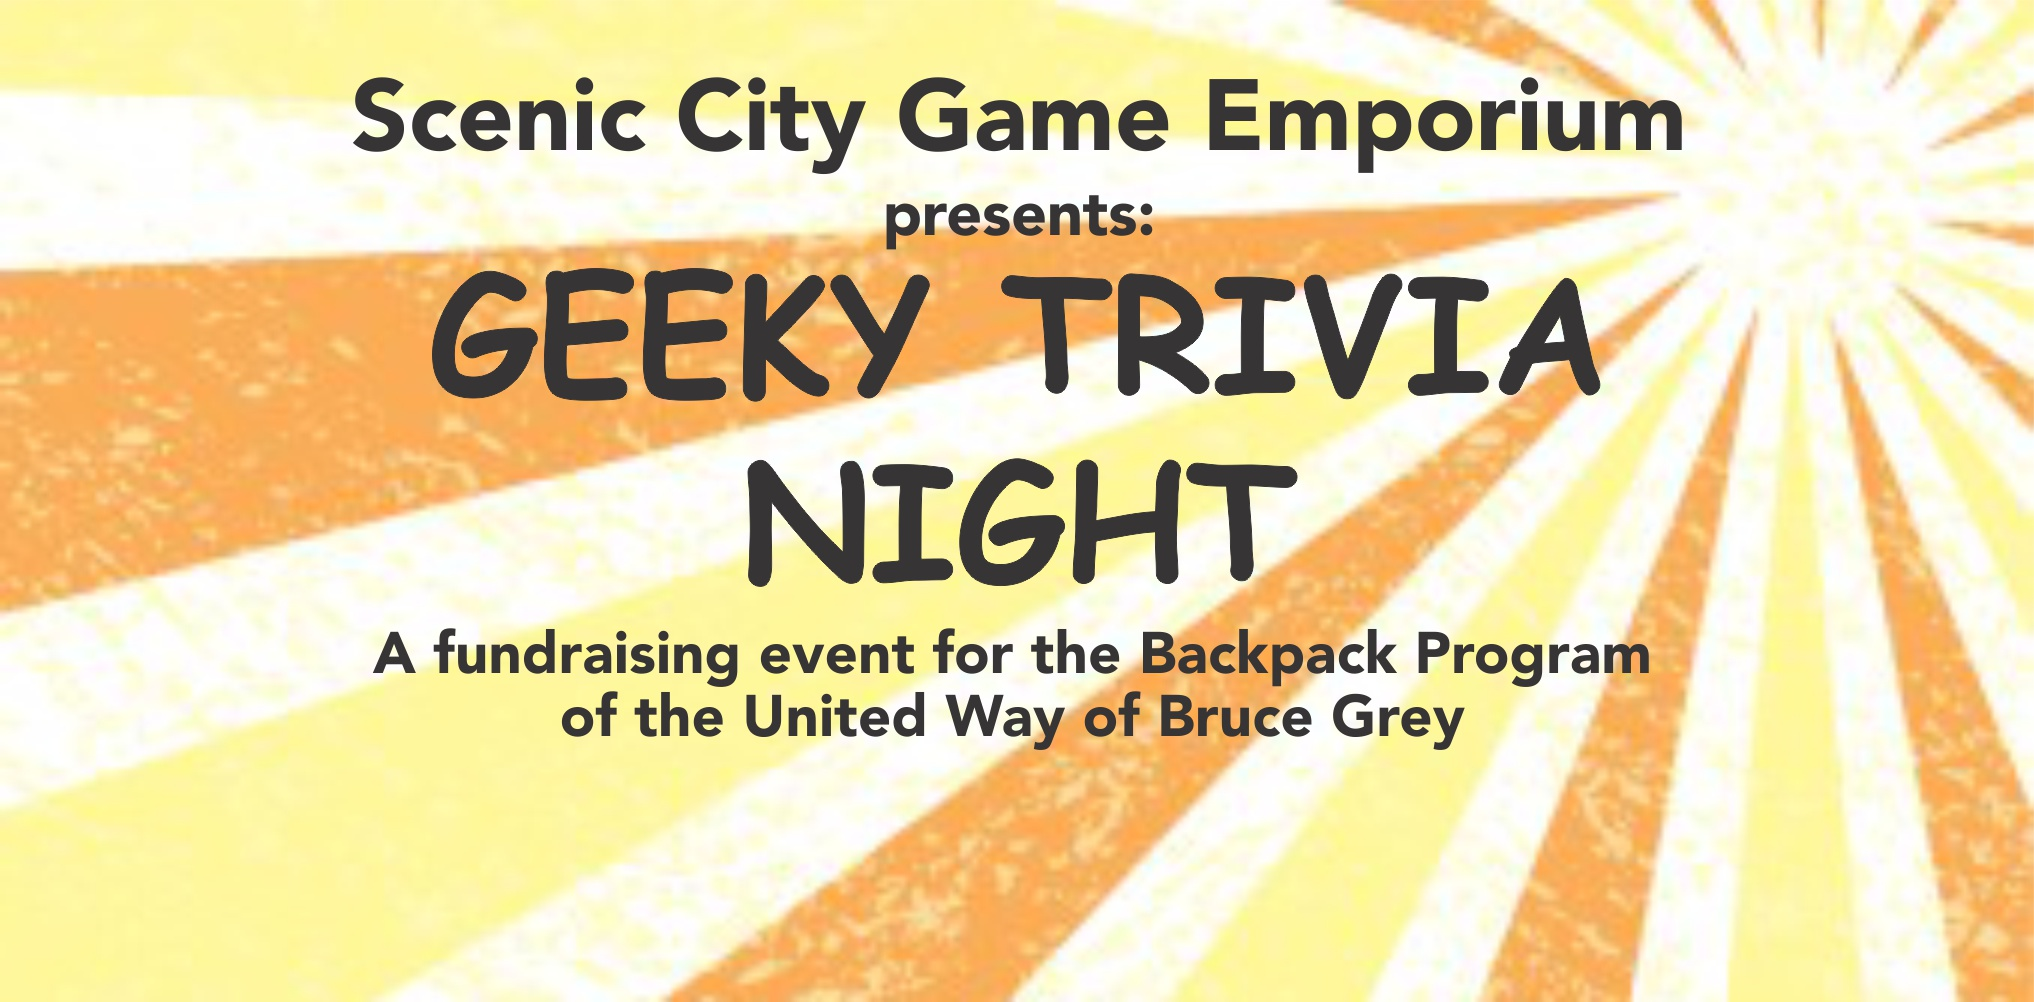 Scenic City Game Emporium presents Geeky Trivia Night